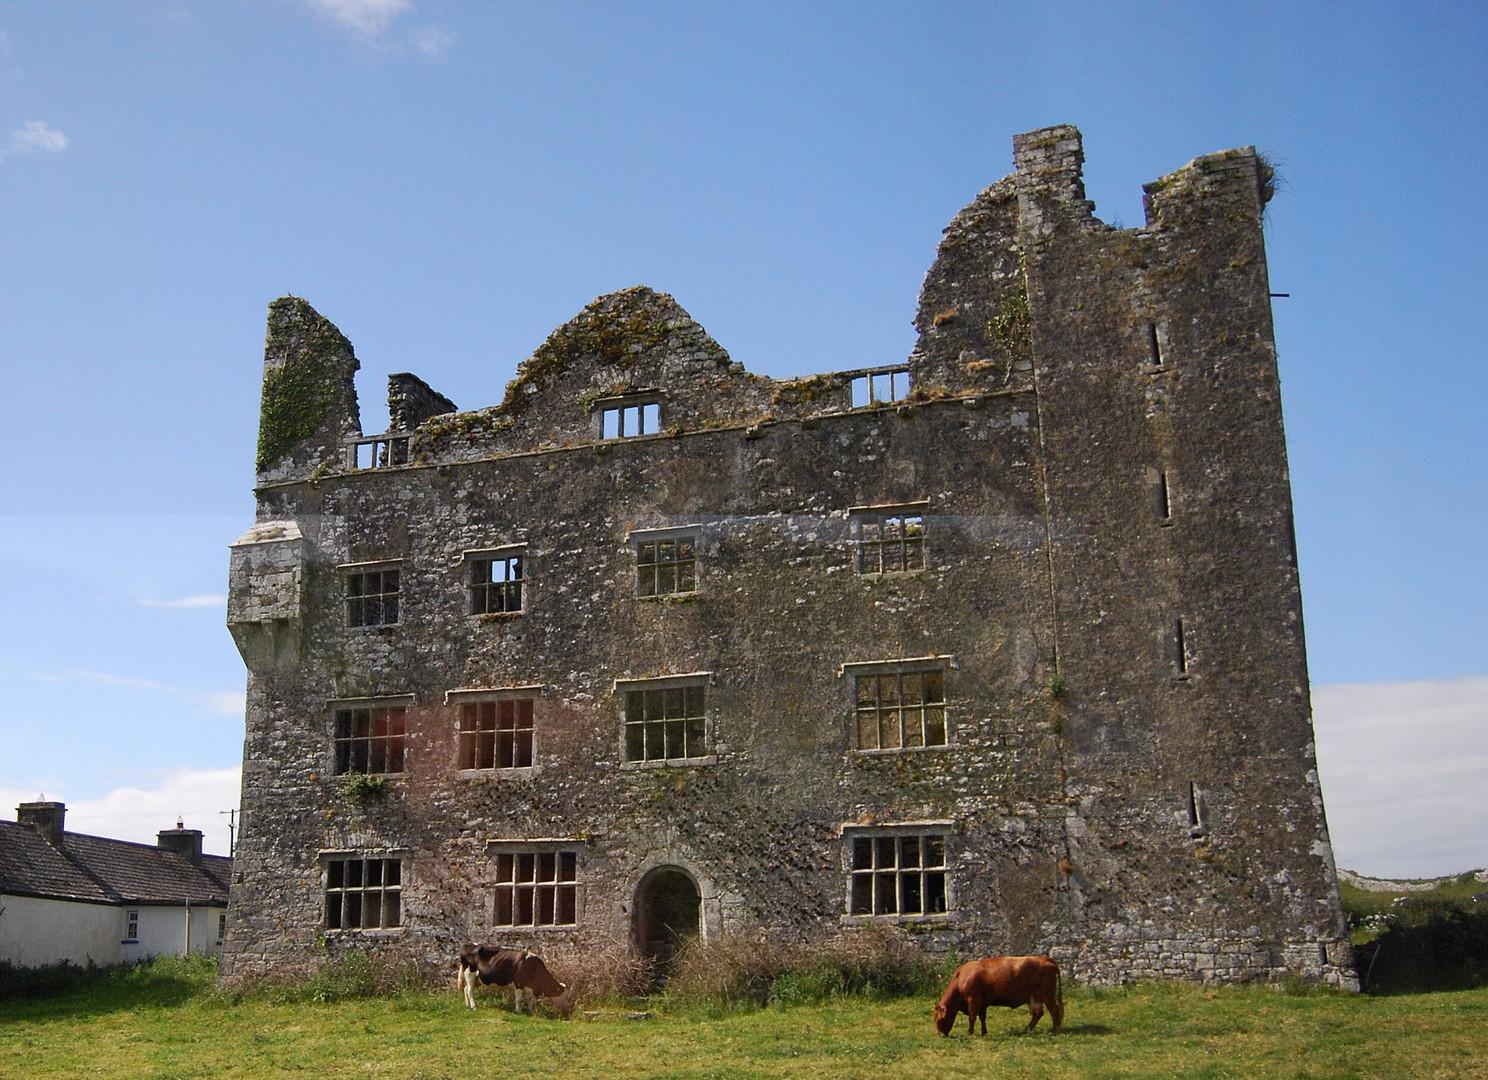 Irland - die Ruine